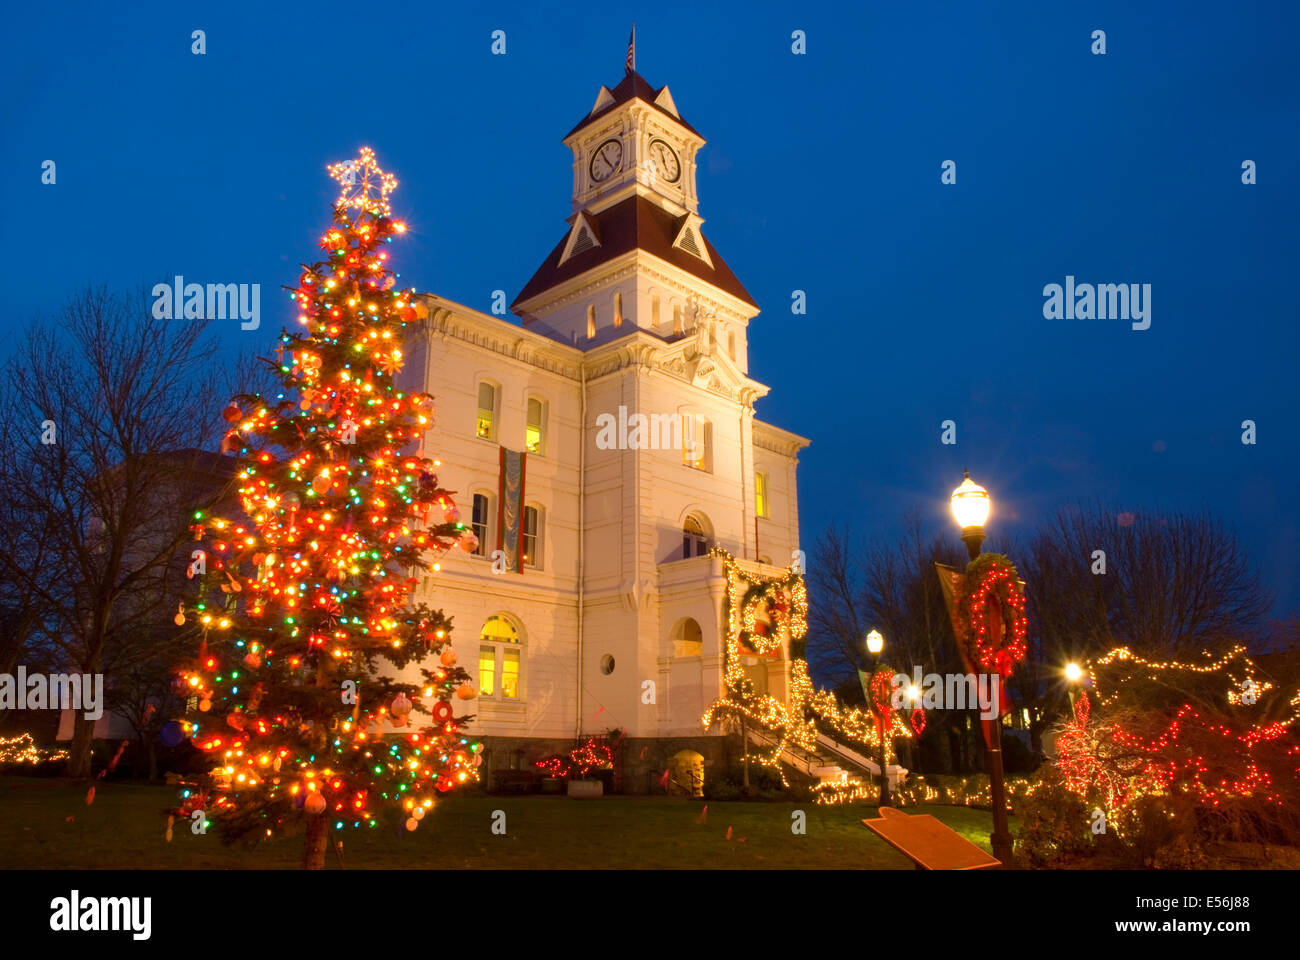 Christmas Lights Corvallis Oregon 2020 Benton County Courthouse with Christmas lights, Corvallis, Oregon